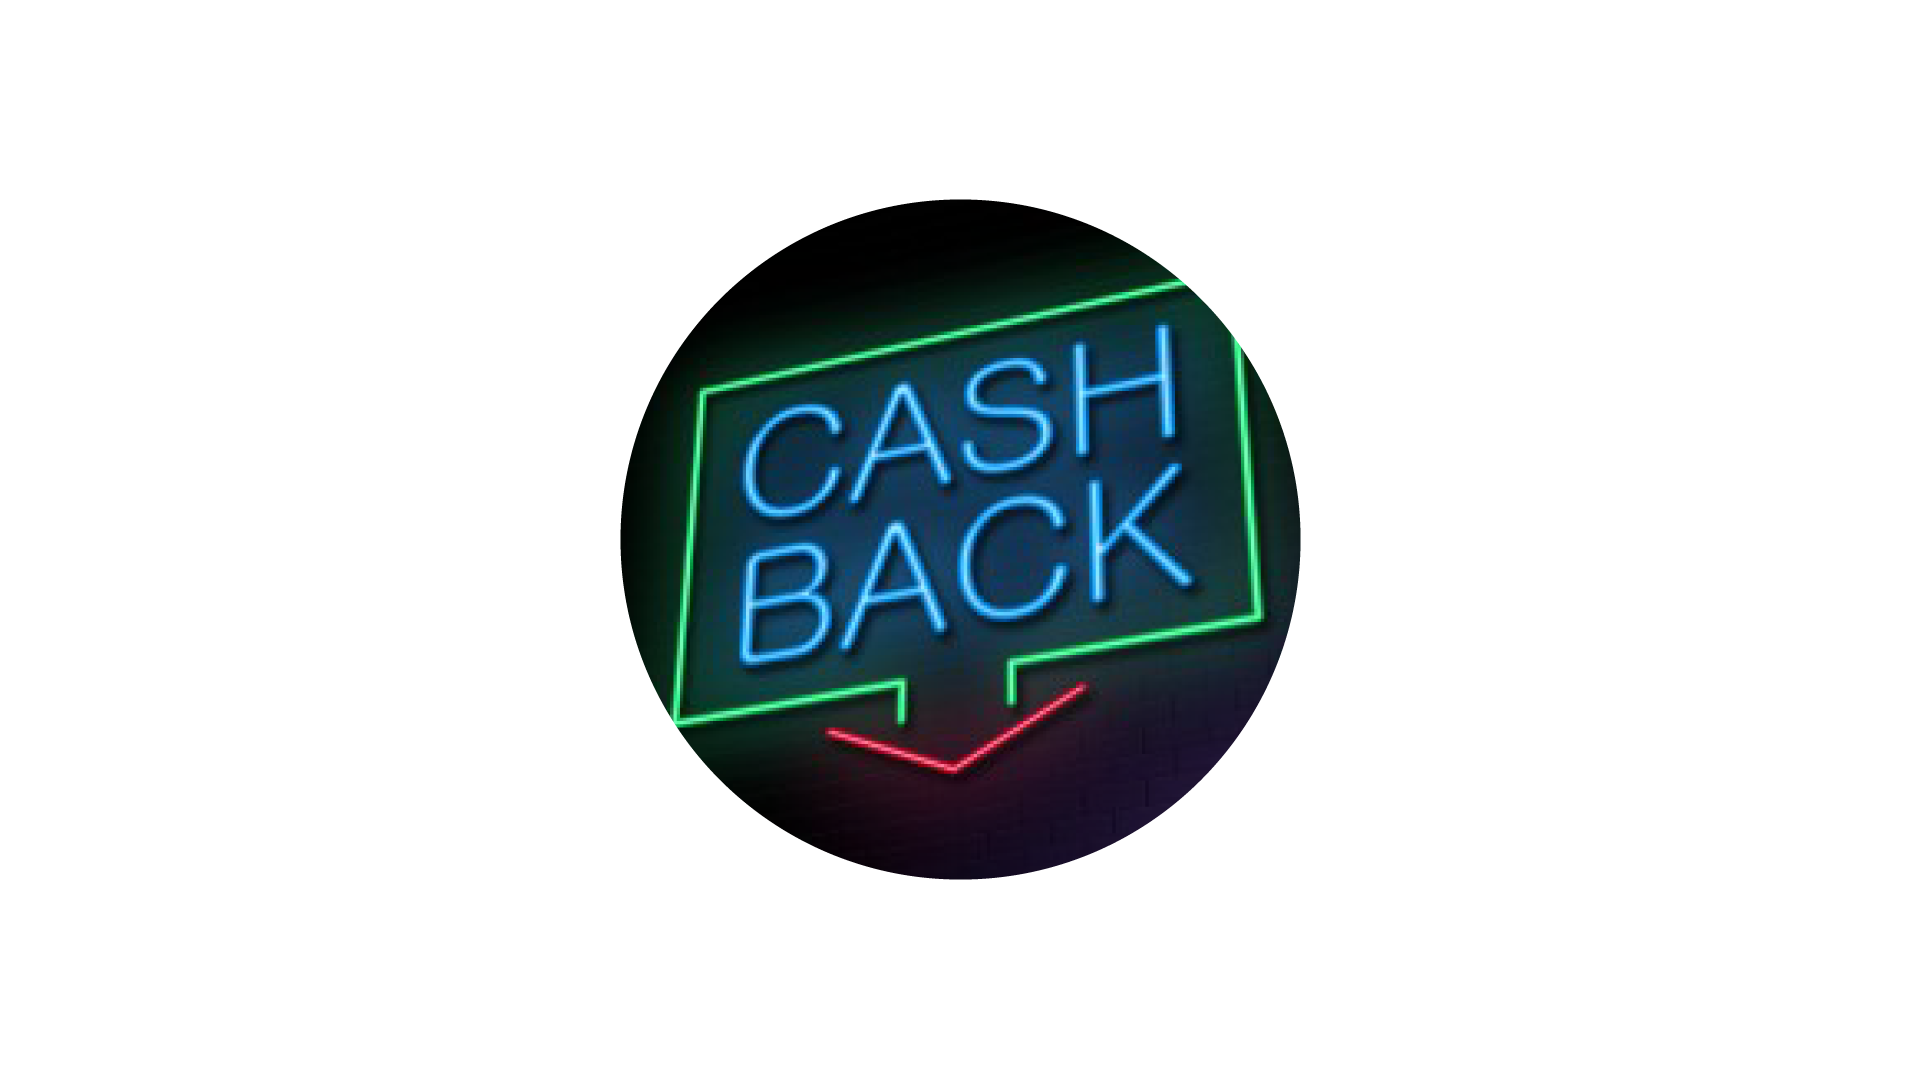 Forex Cashback Rebate - Highest Cashback and Rebate Paid